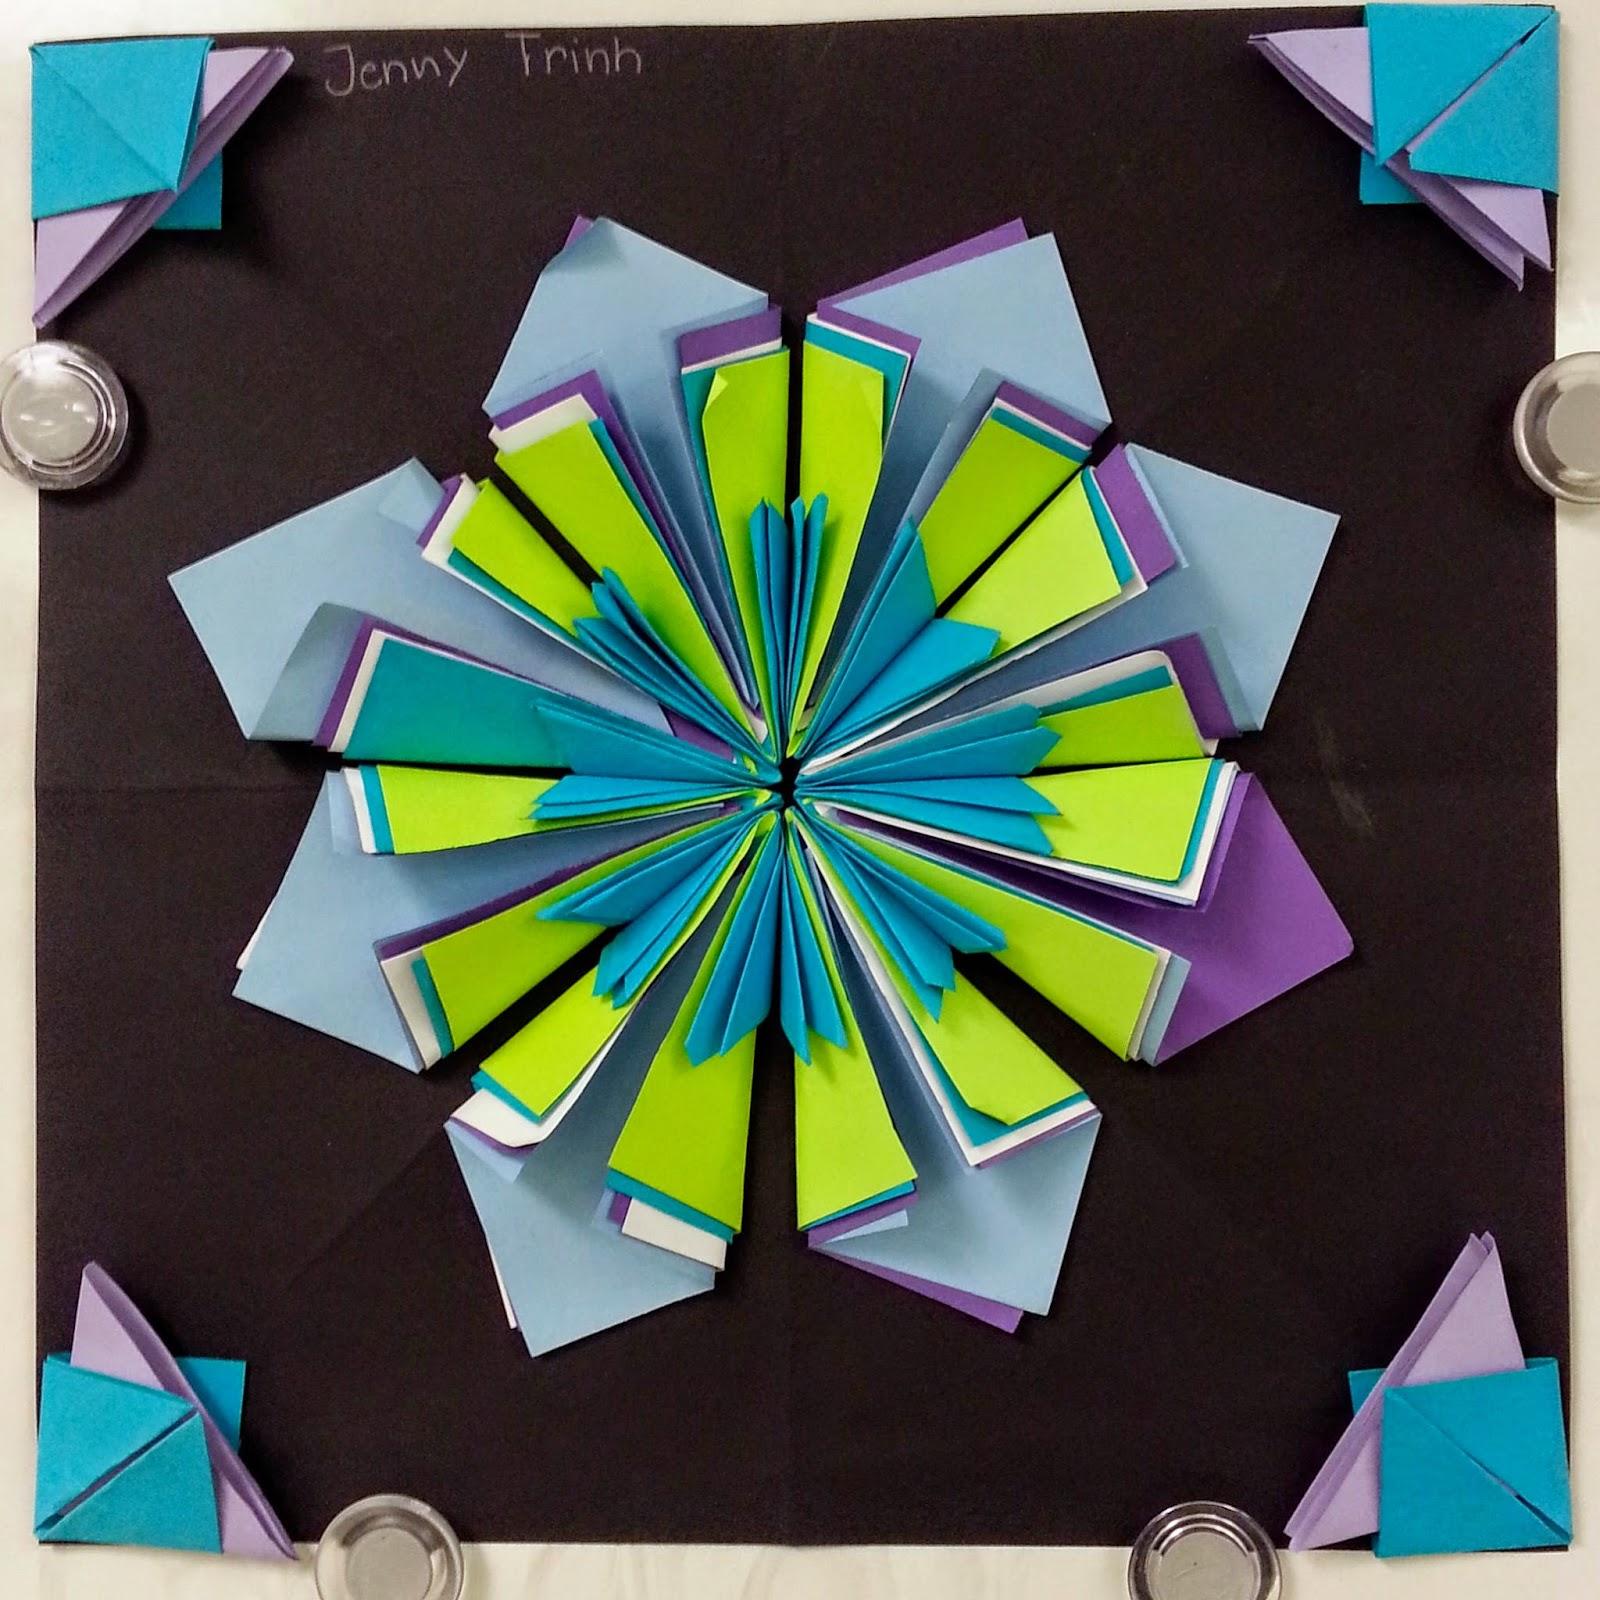 S additionally Romarebeardenbb in addition Symmetry X together with E D A A C E B Cddc F D Hexagon Activities For Kindergarten Hexagon Preschool likewise Original. on 1st grade symmetry